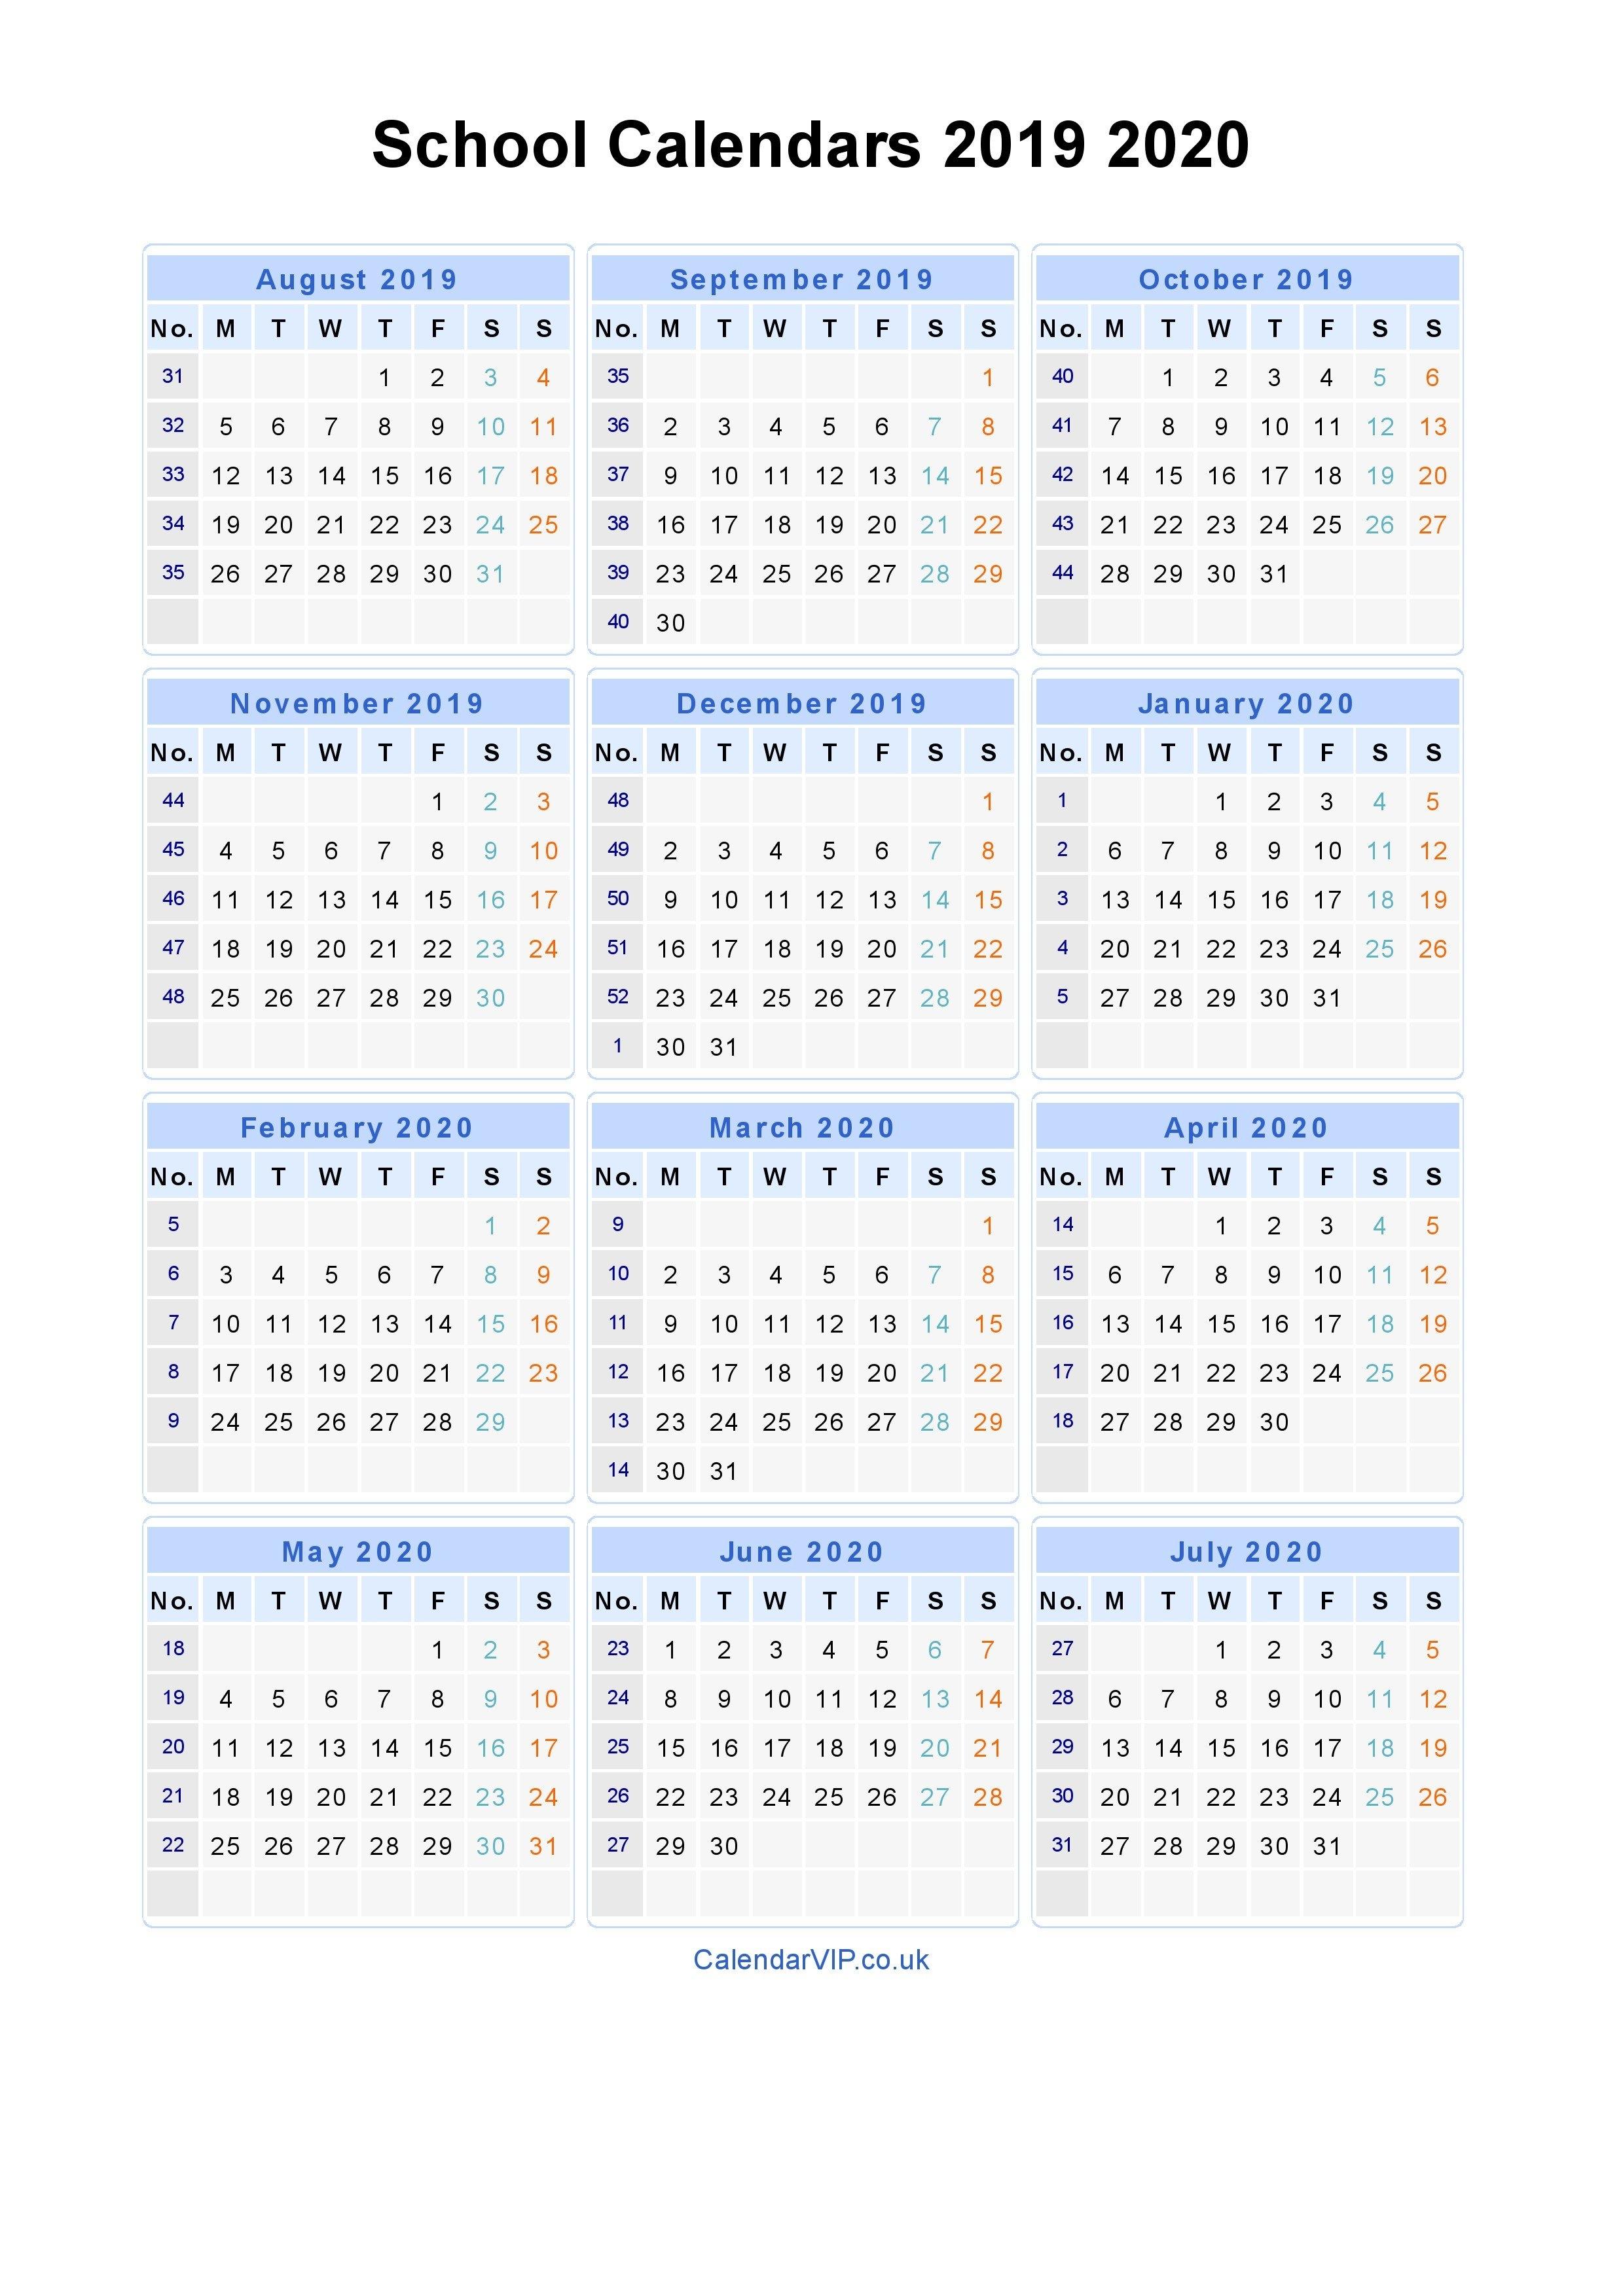 School Calendars 2019 2020 – Calendar From August 2019 To July 2020 2019 Calendar 2020 Printable